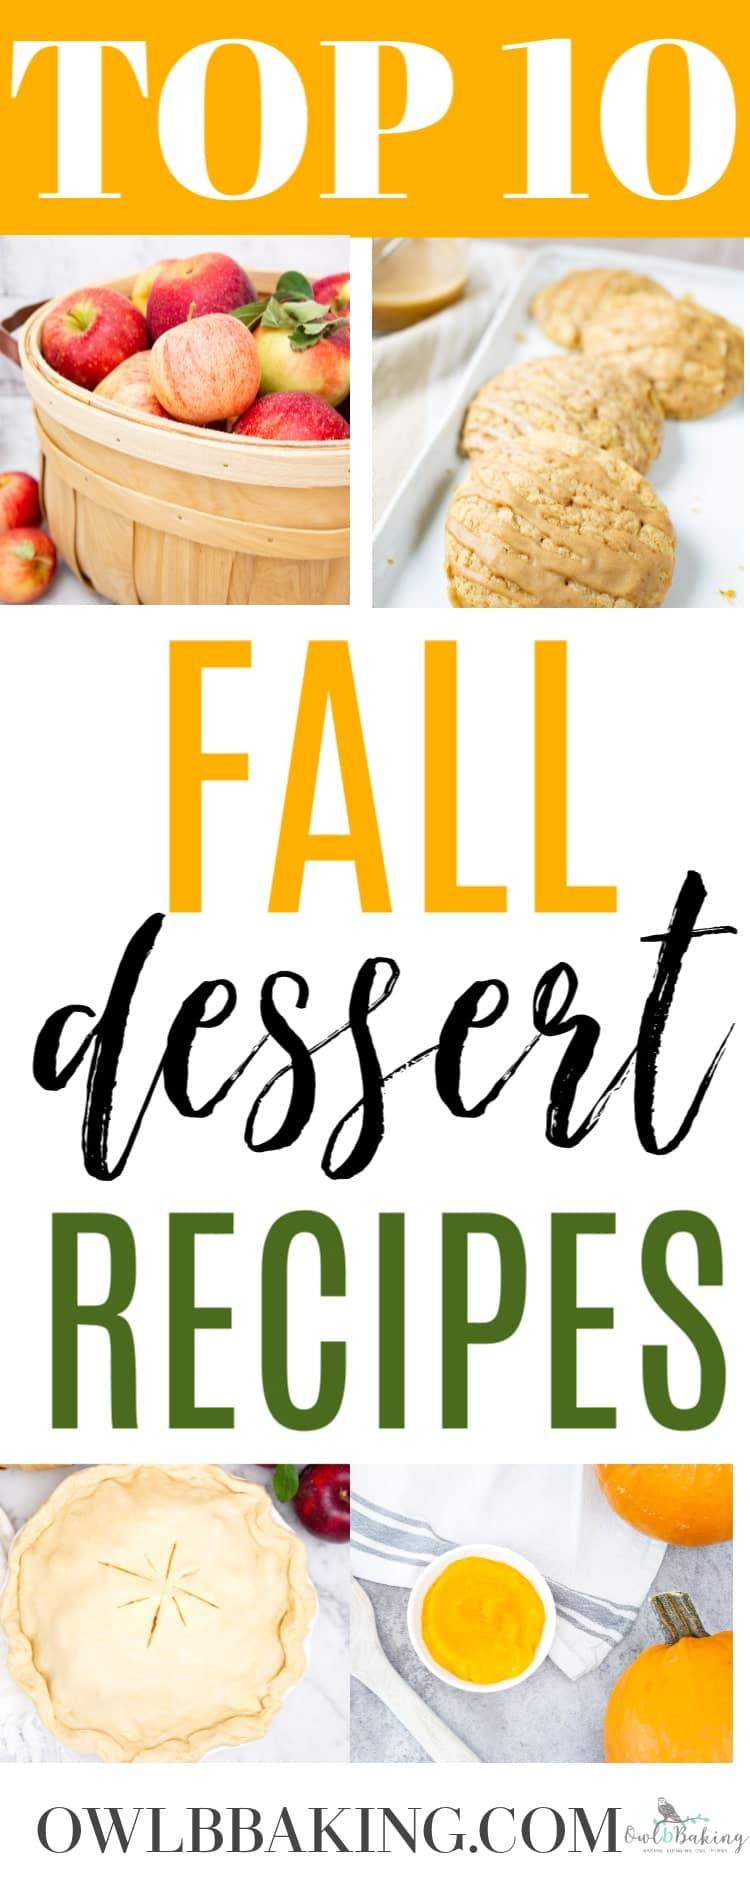 Top 10 Fall Dessert Recipes